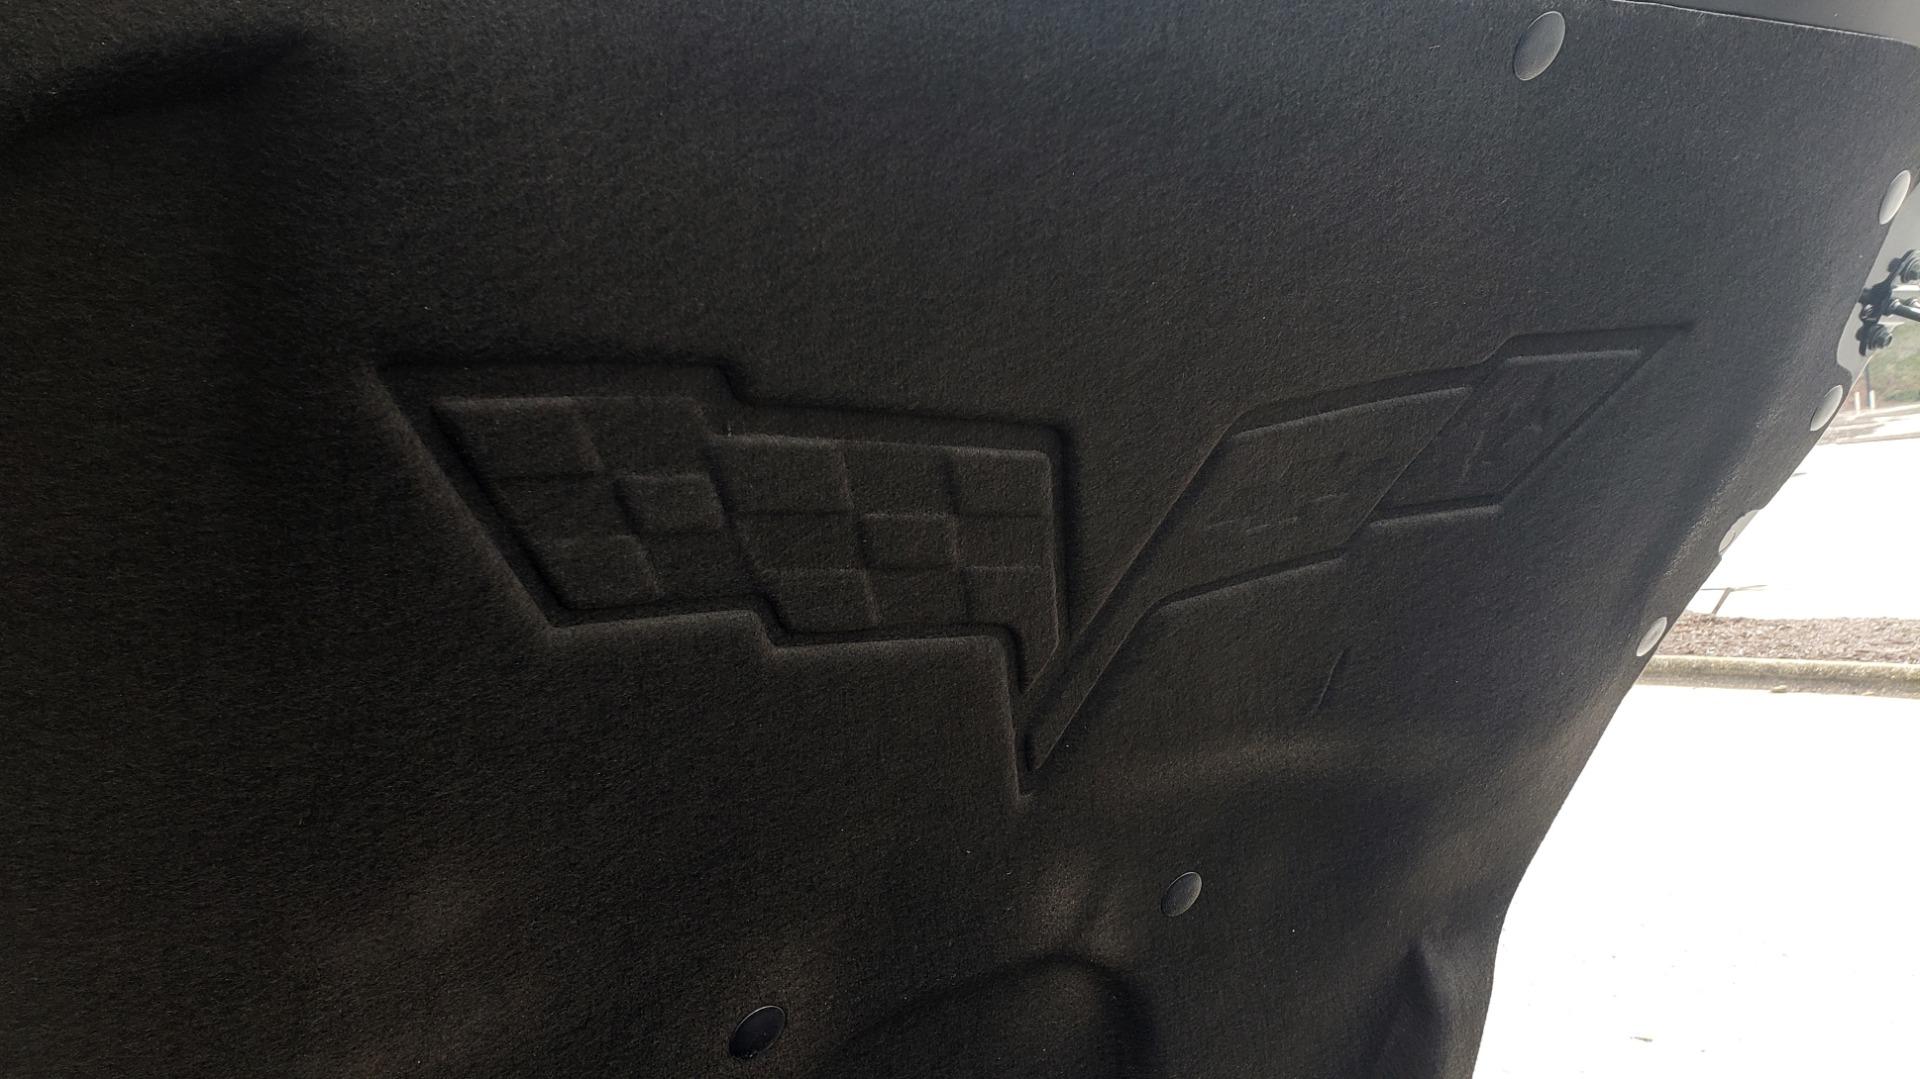 Used 2012 Chevrolet CORVETTE Z16 GRAND SPORT 3LT CONVERTIBLE / 6-SPD AUTO / NAV for sale $38,990 at Formula Imports in Charlotte NC 28227 21